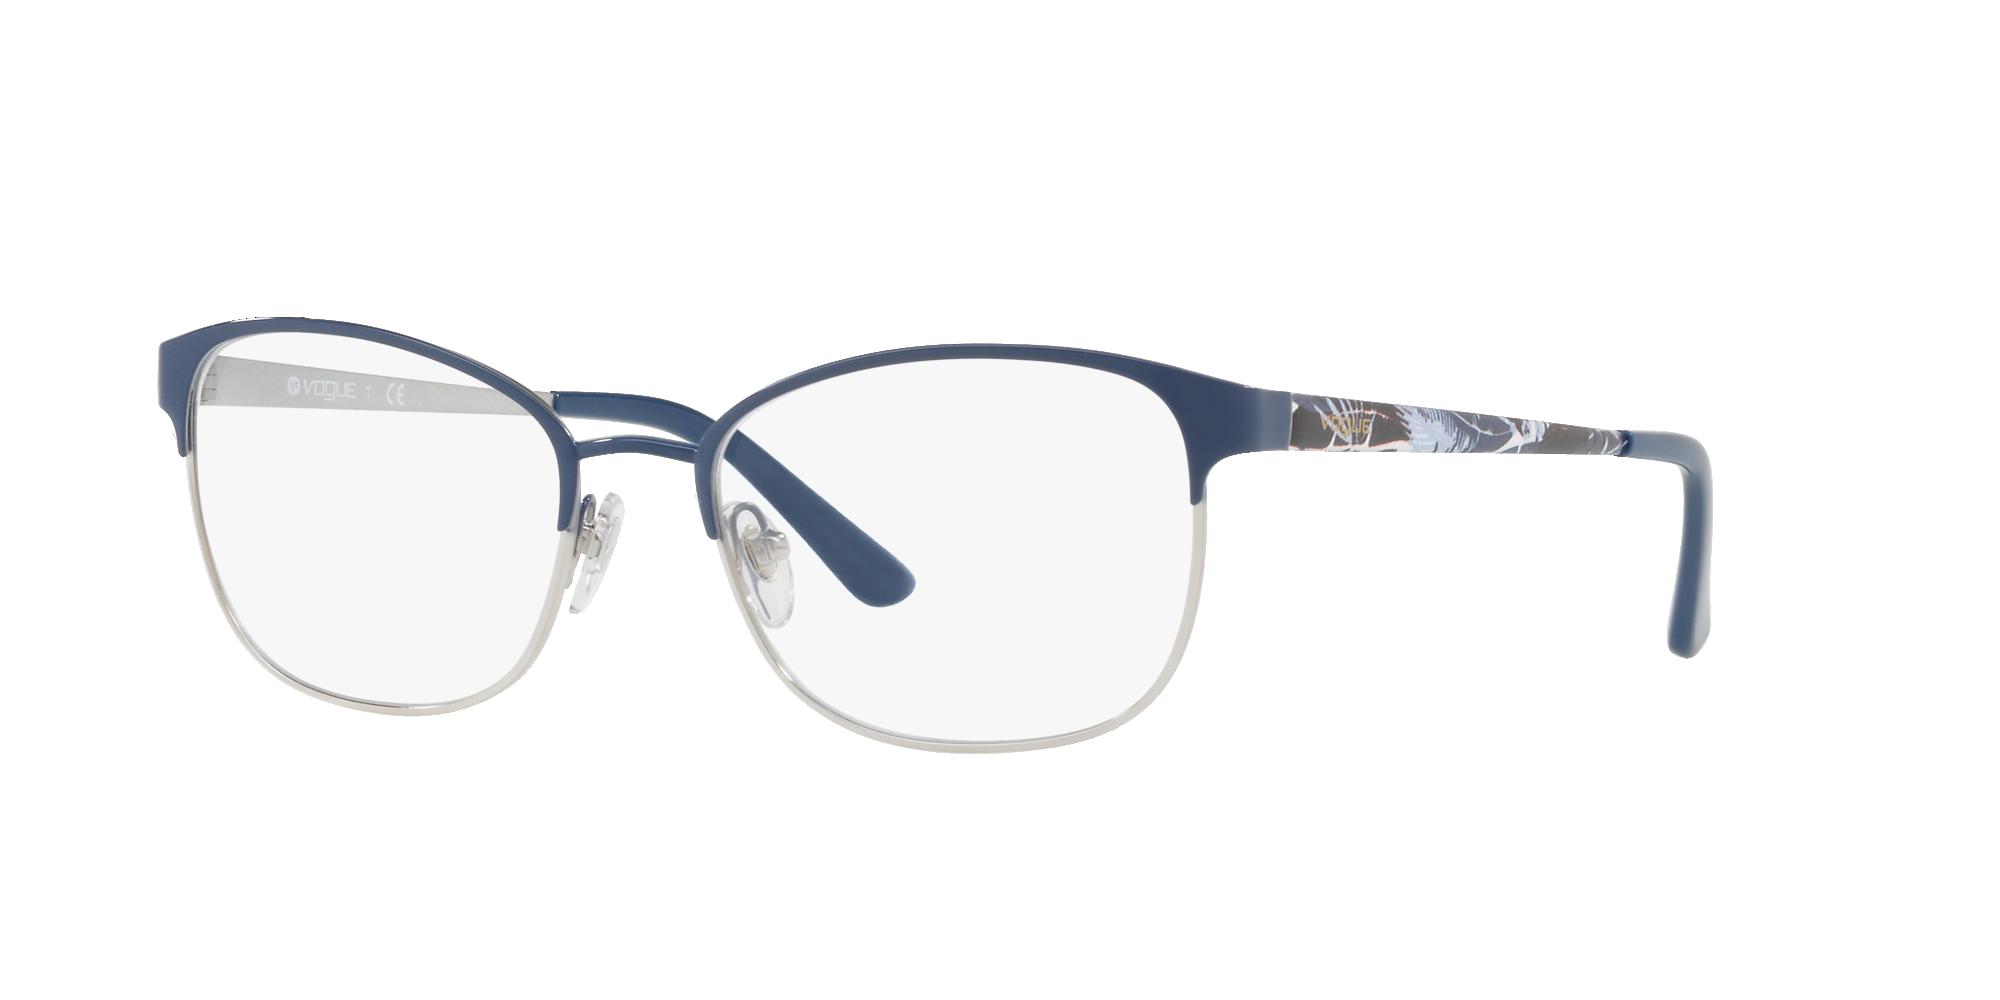 2d6a97298cc Optical VO4072 - Blue silver - Demo Lens - Metal